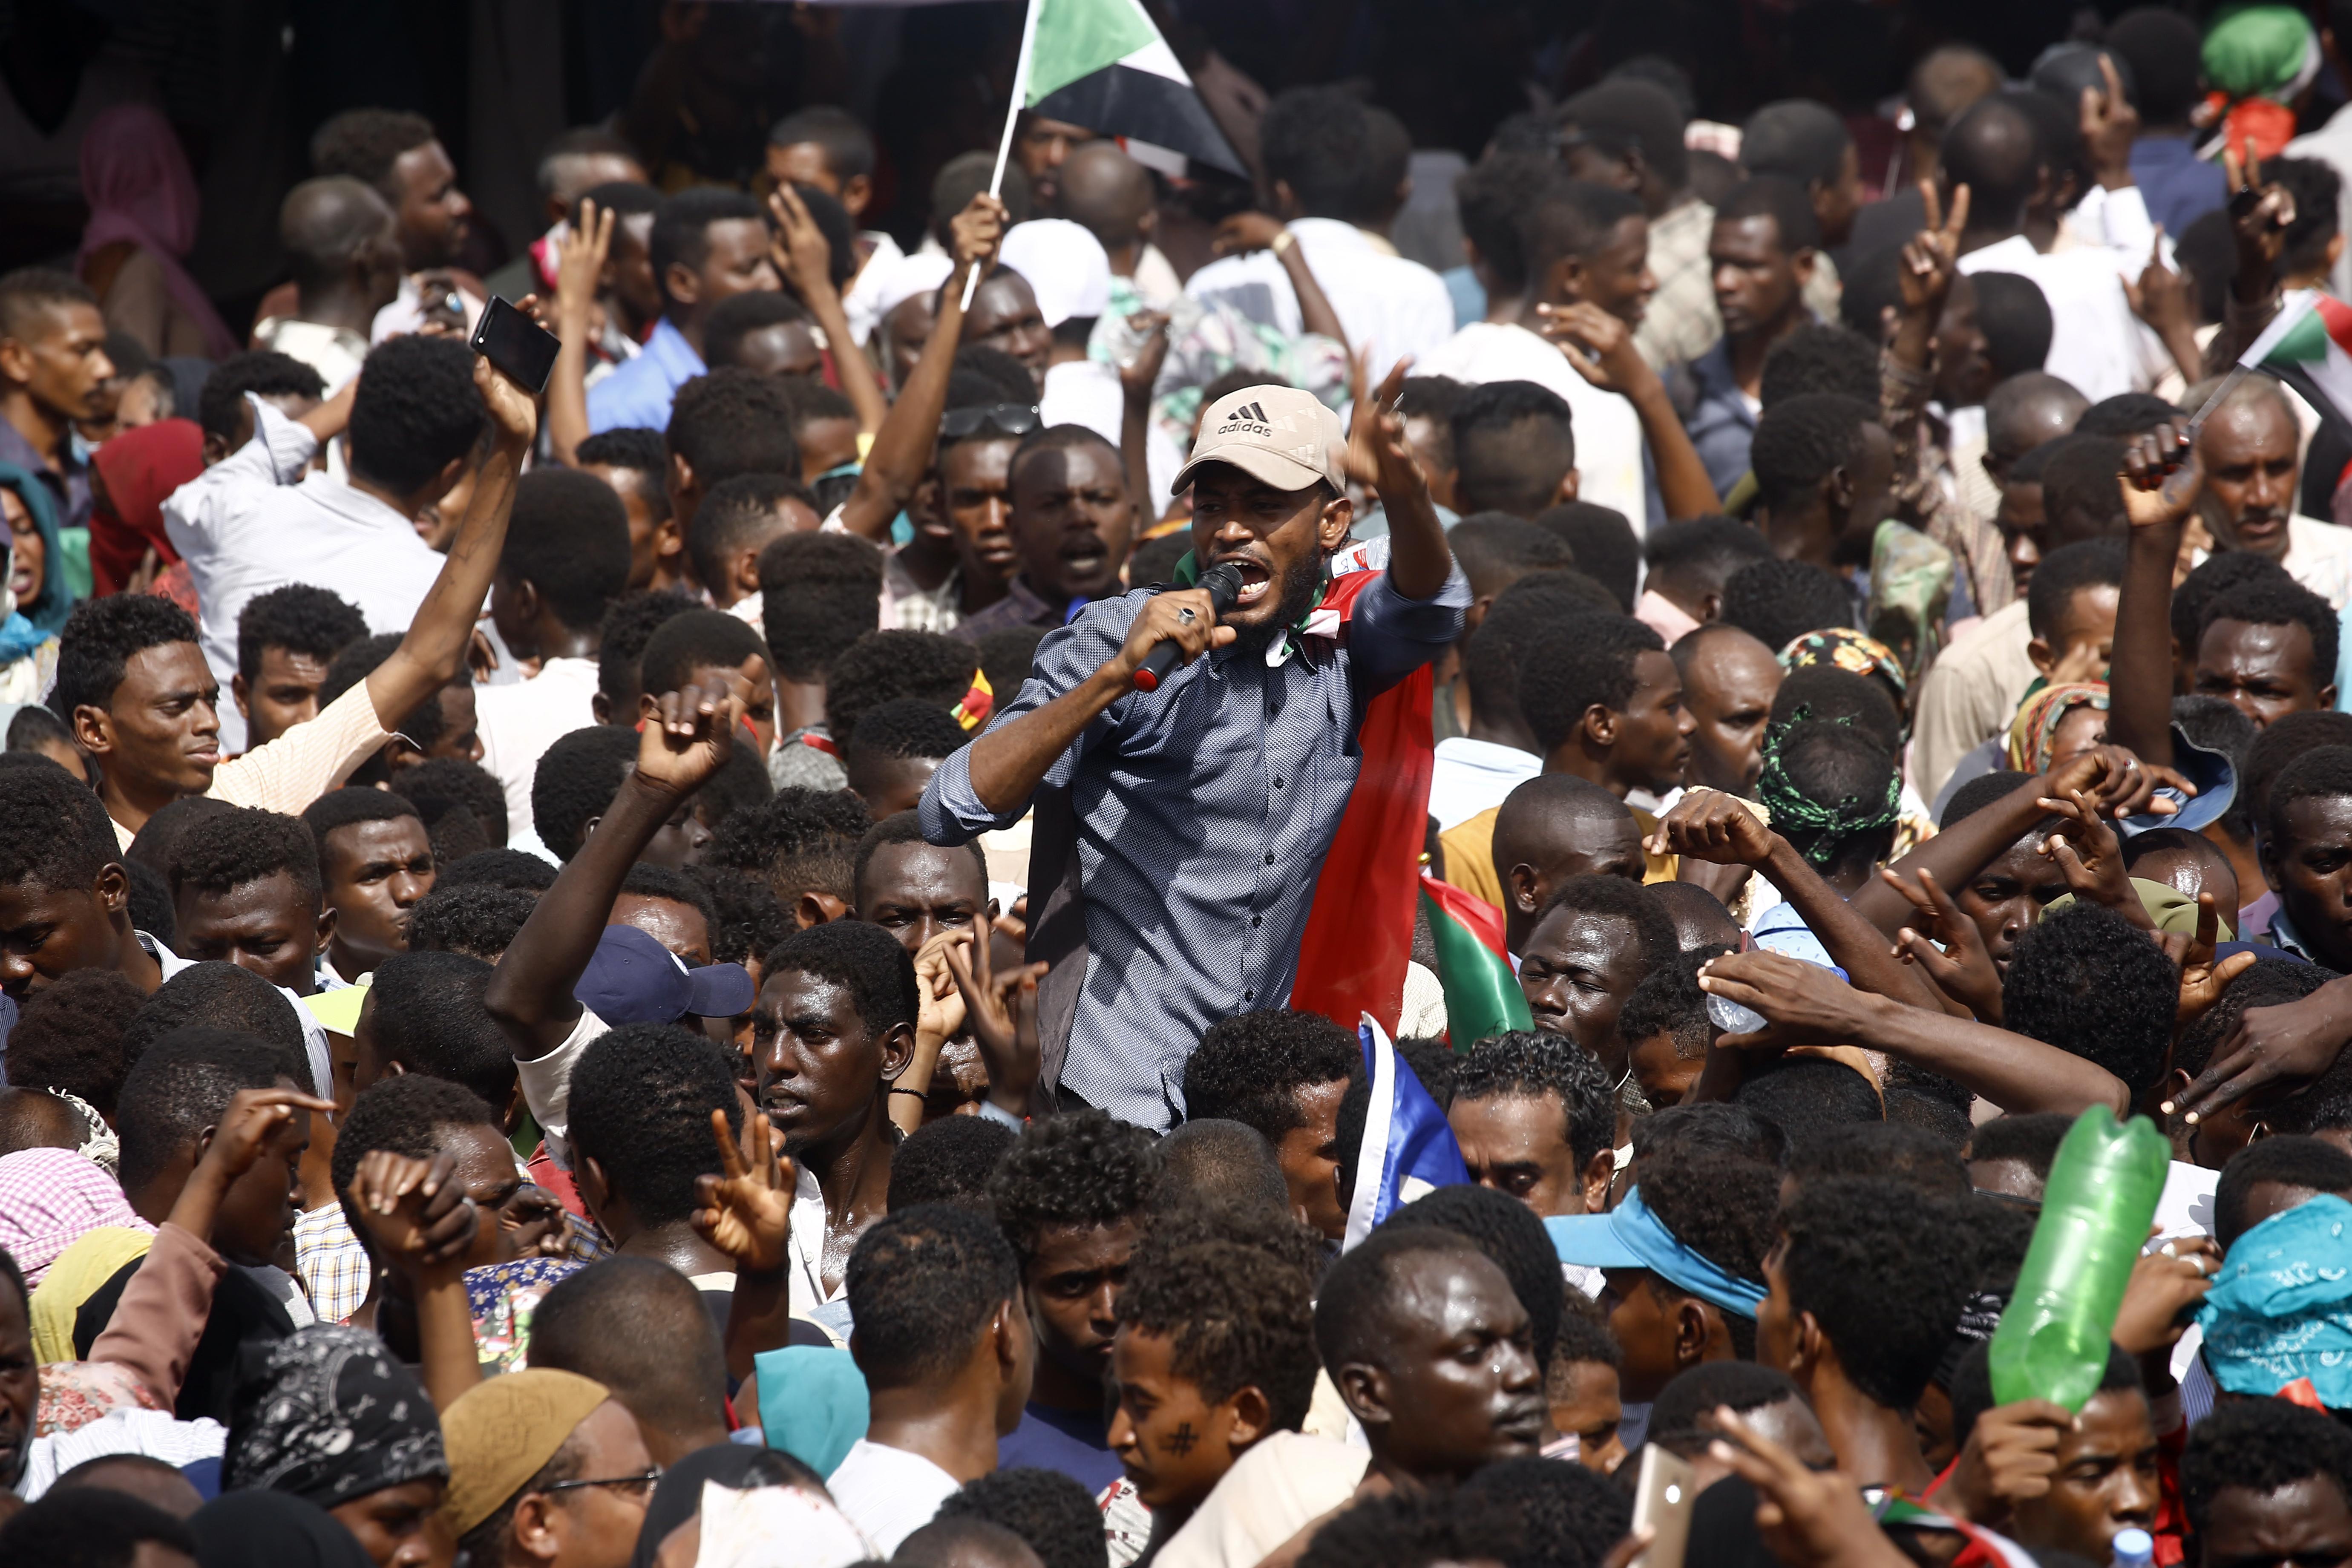 "سودانيون معارضون للبشير يتظاهرون بعد عزله بـ""انقلاب عسكري"""